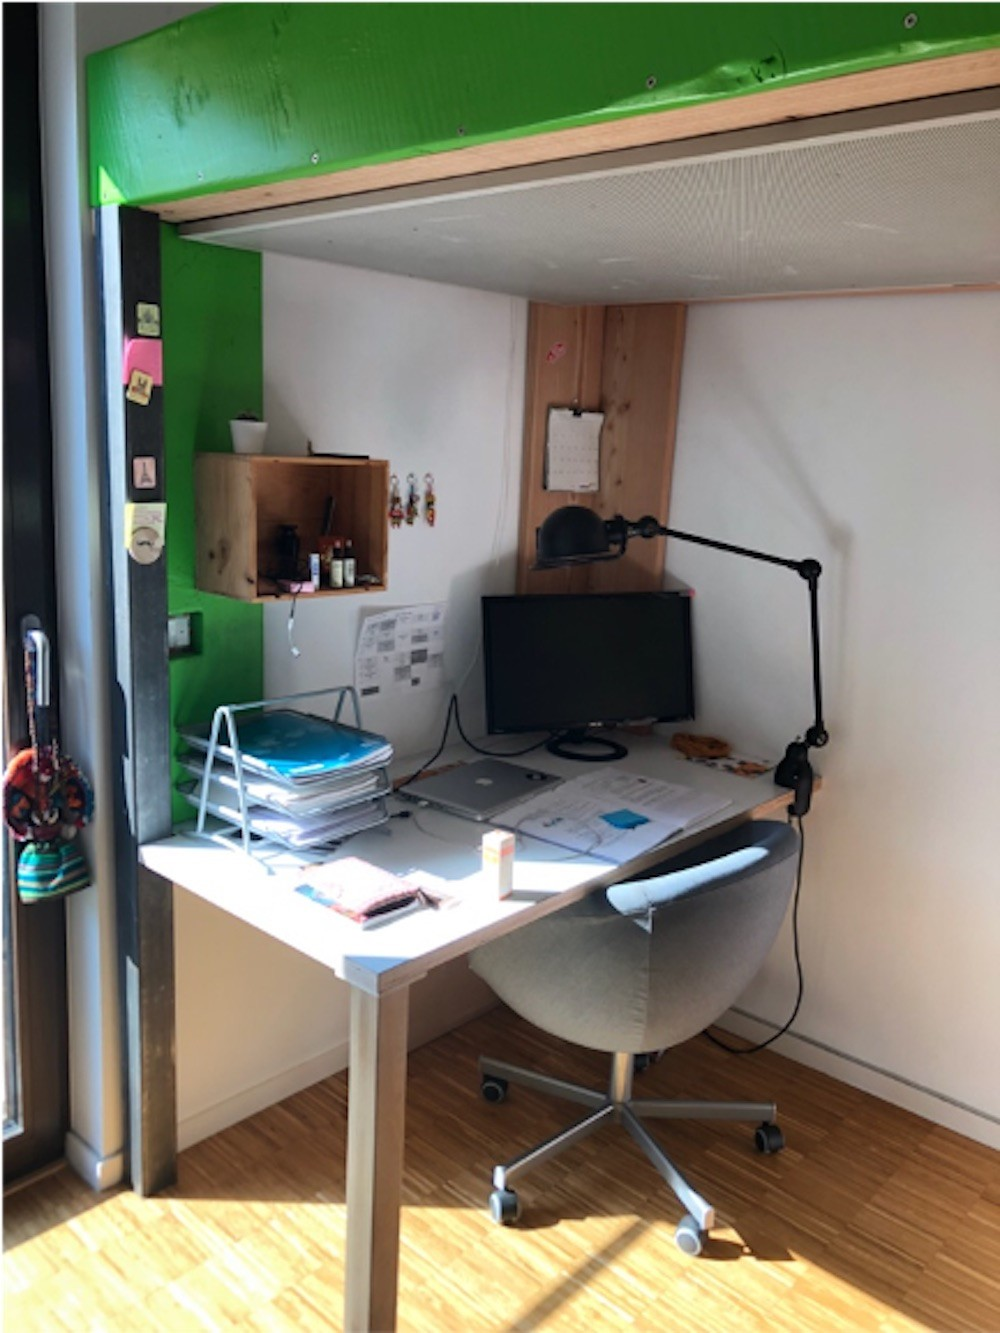 Chiara's bedroom in Pfaffenthal, 2018. Photo provided by Séverine Zimmer and Chiara Agostini